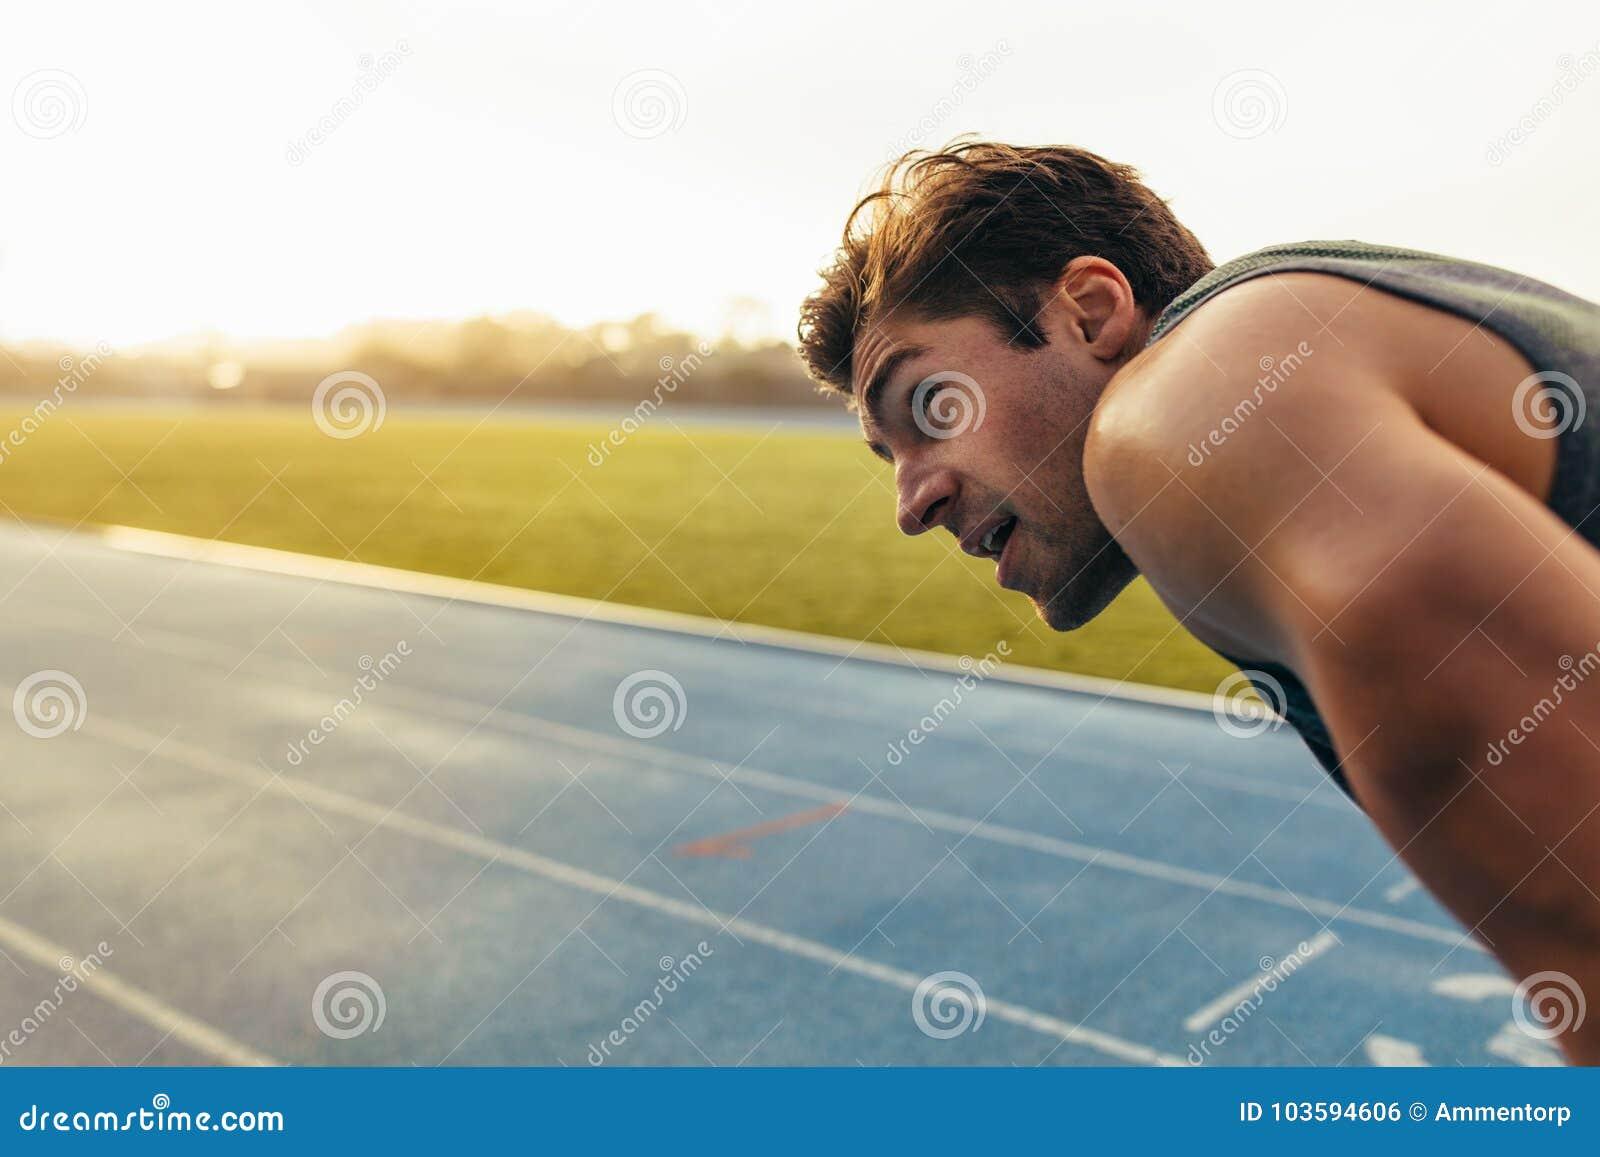 Sprinter που στέκεται στο τρέξιμο της διαδρομής